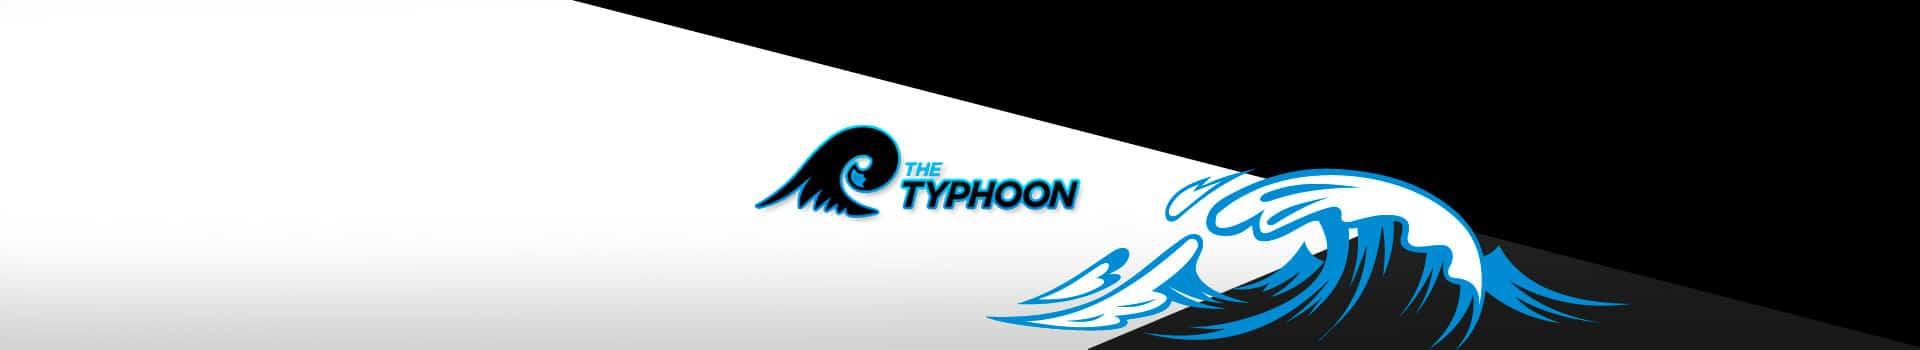 Турнир Typhoon 888poker